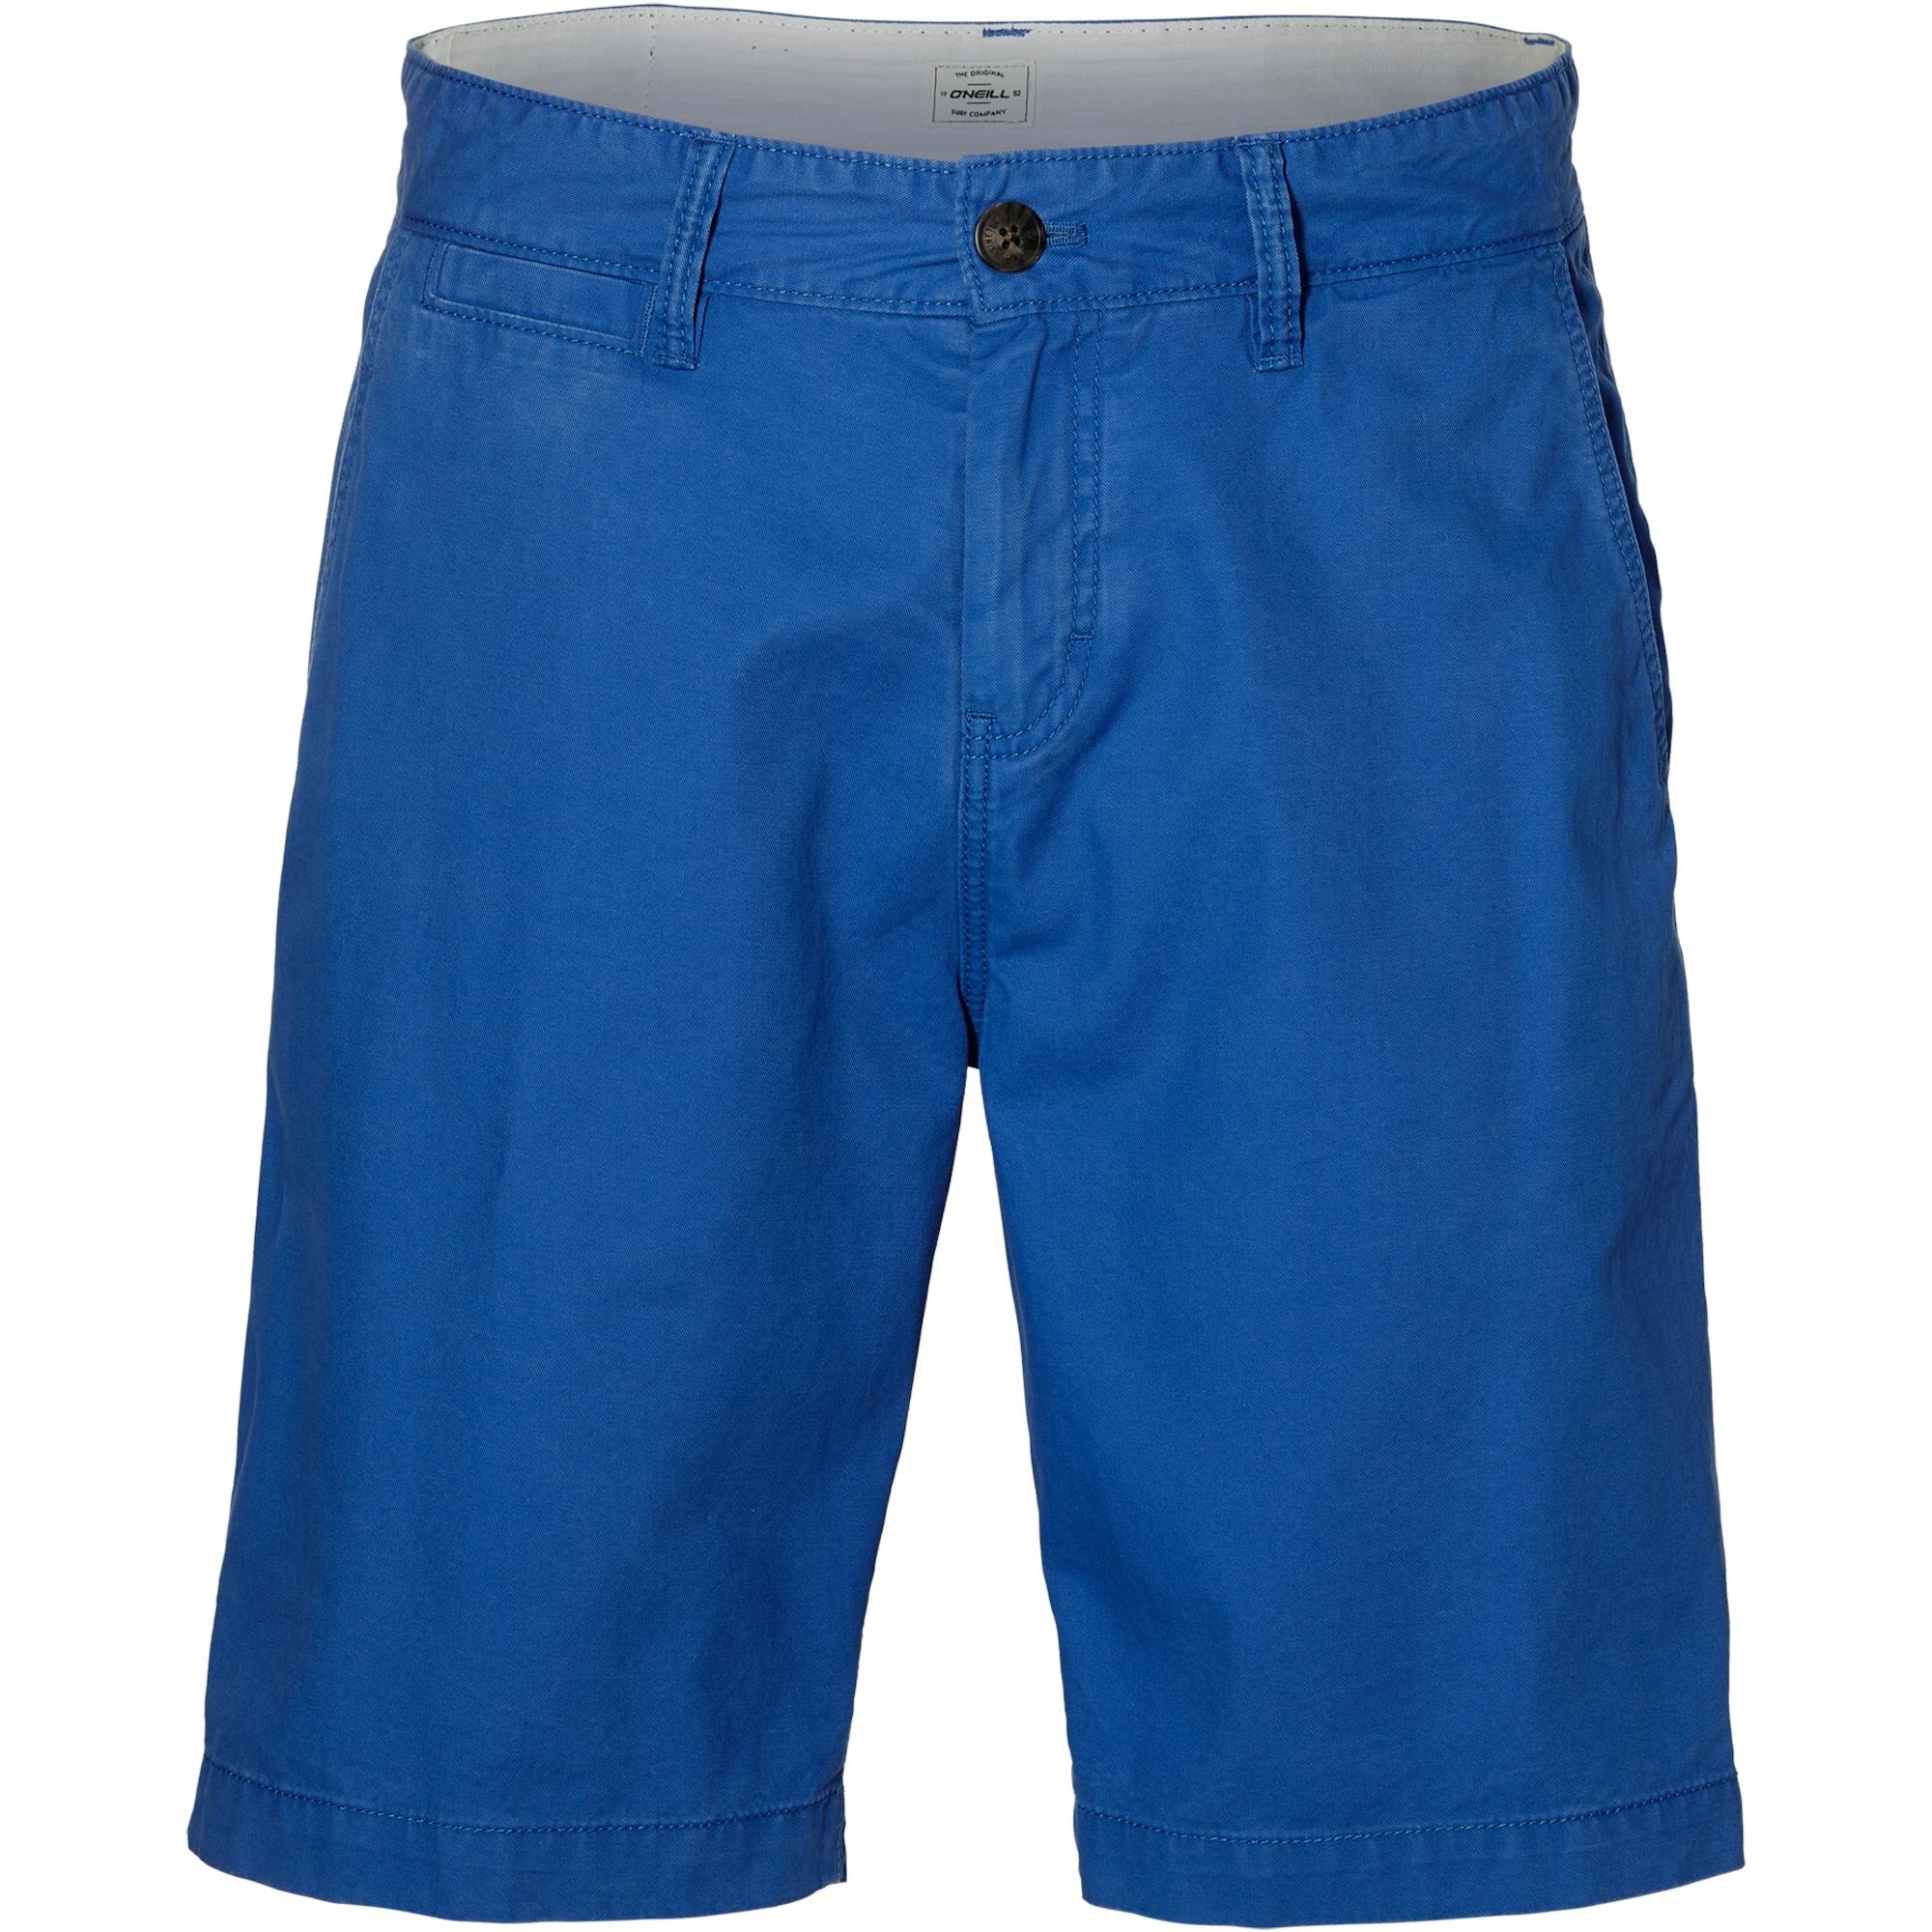 ONEILL Chino kalhoty královská modrá O'NEILL